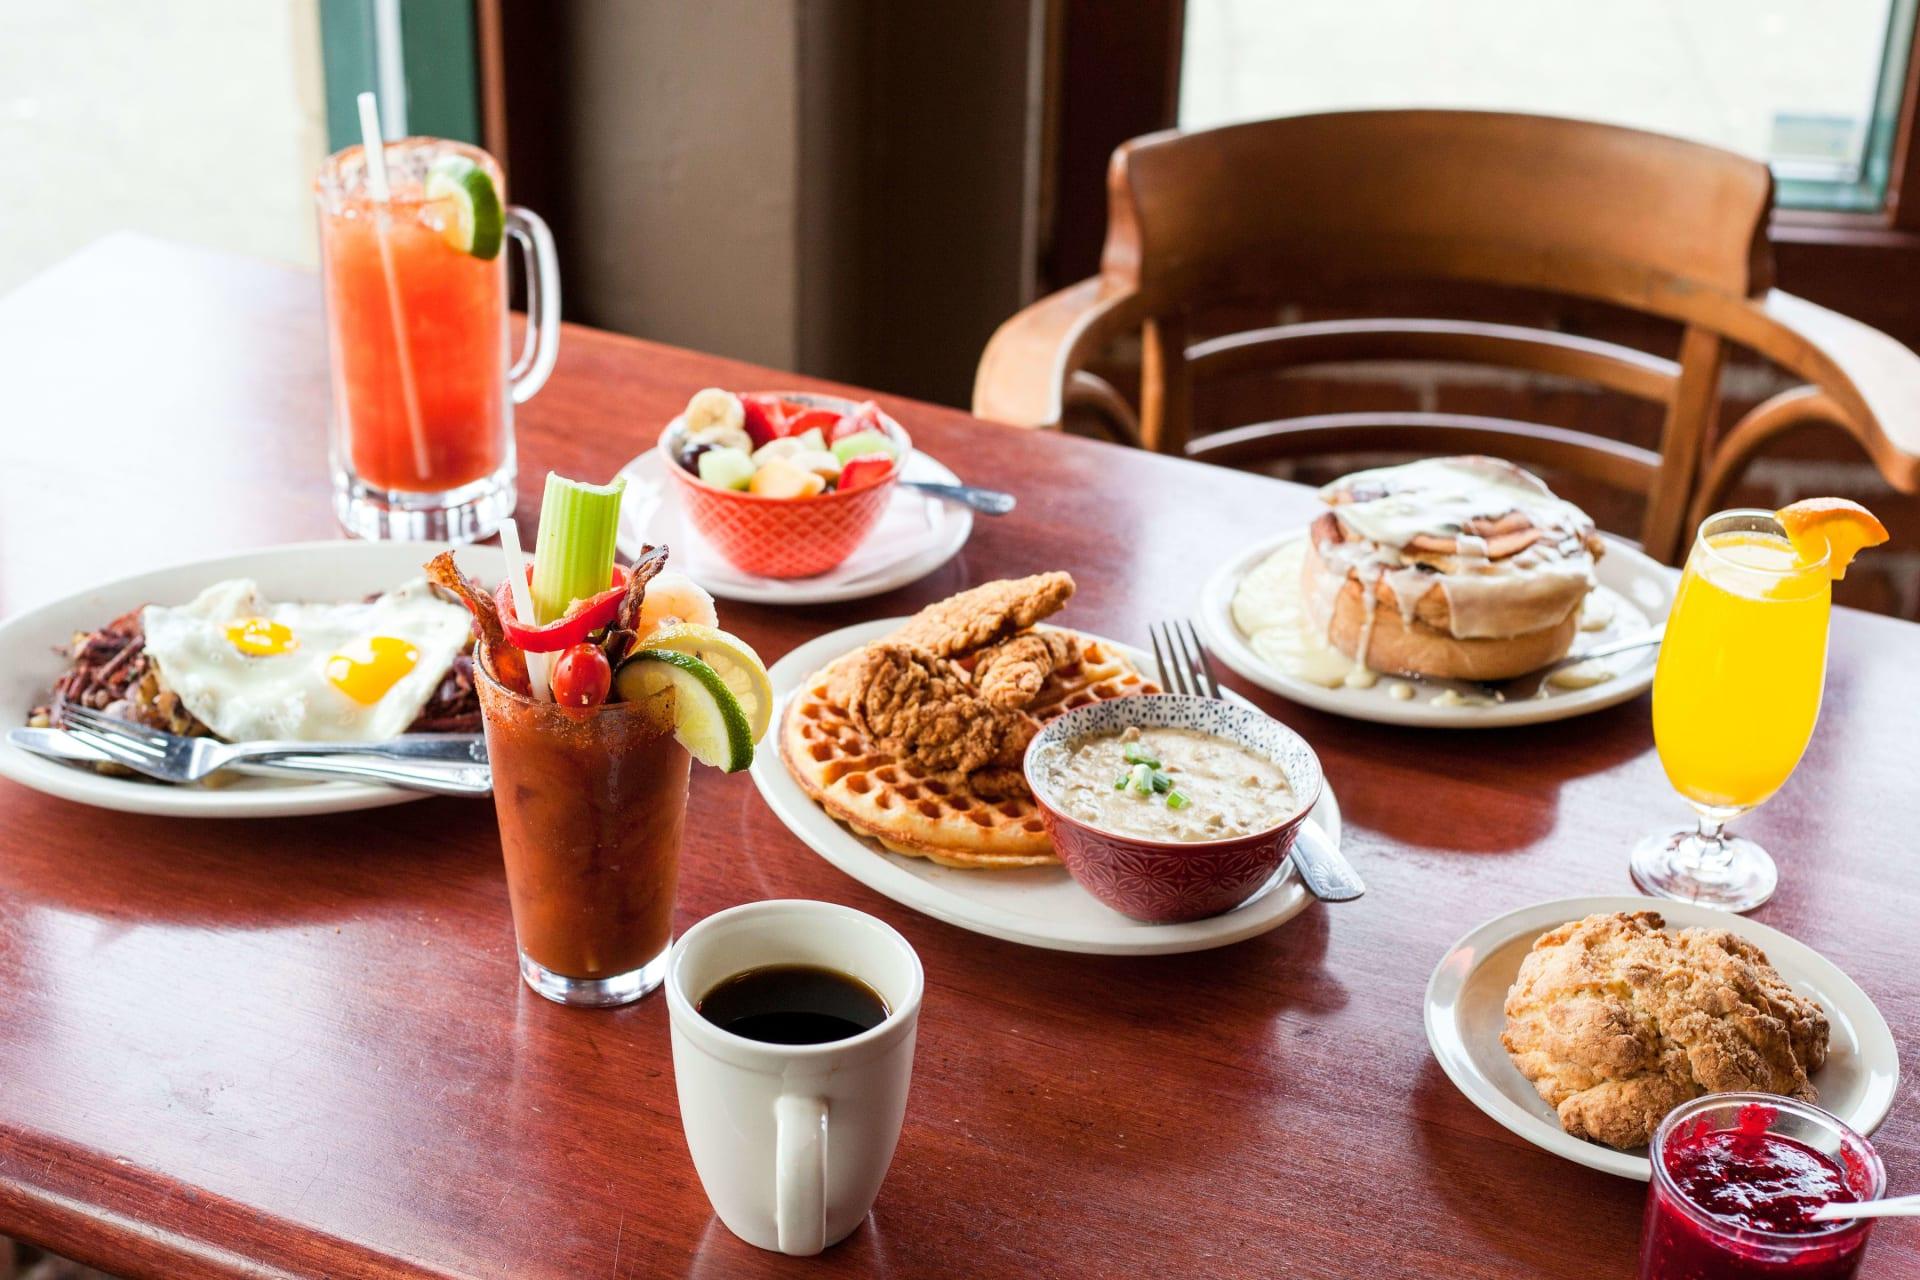 breakfast goods and drinks